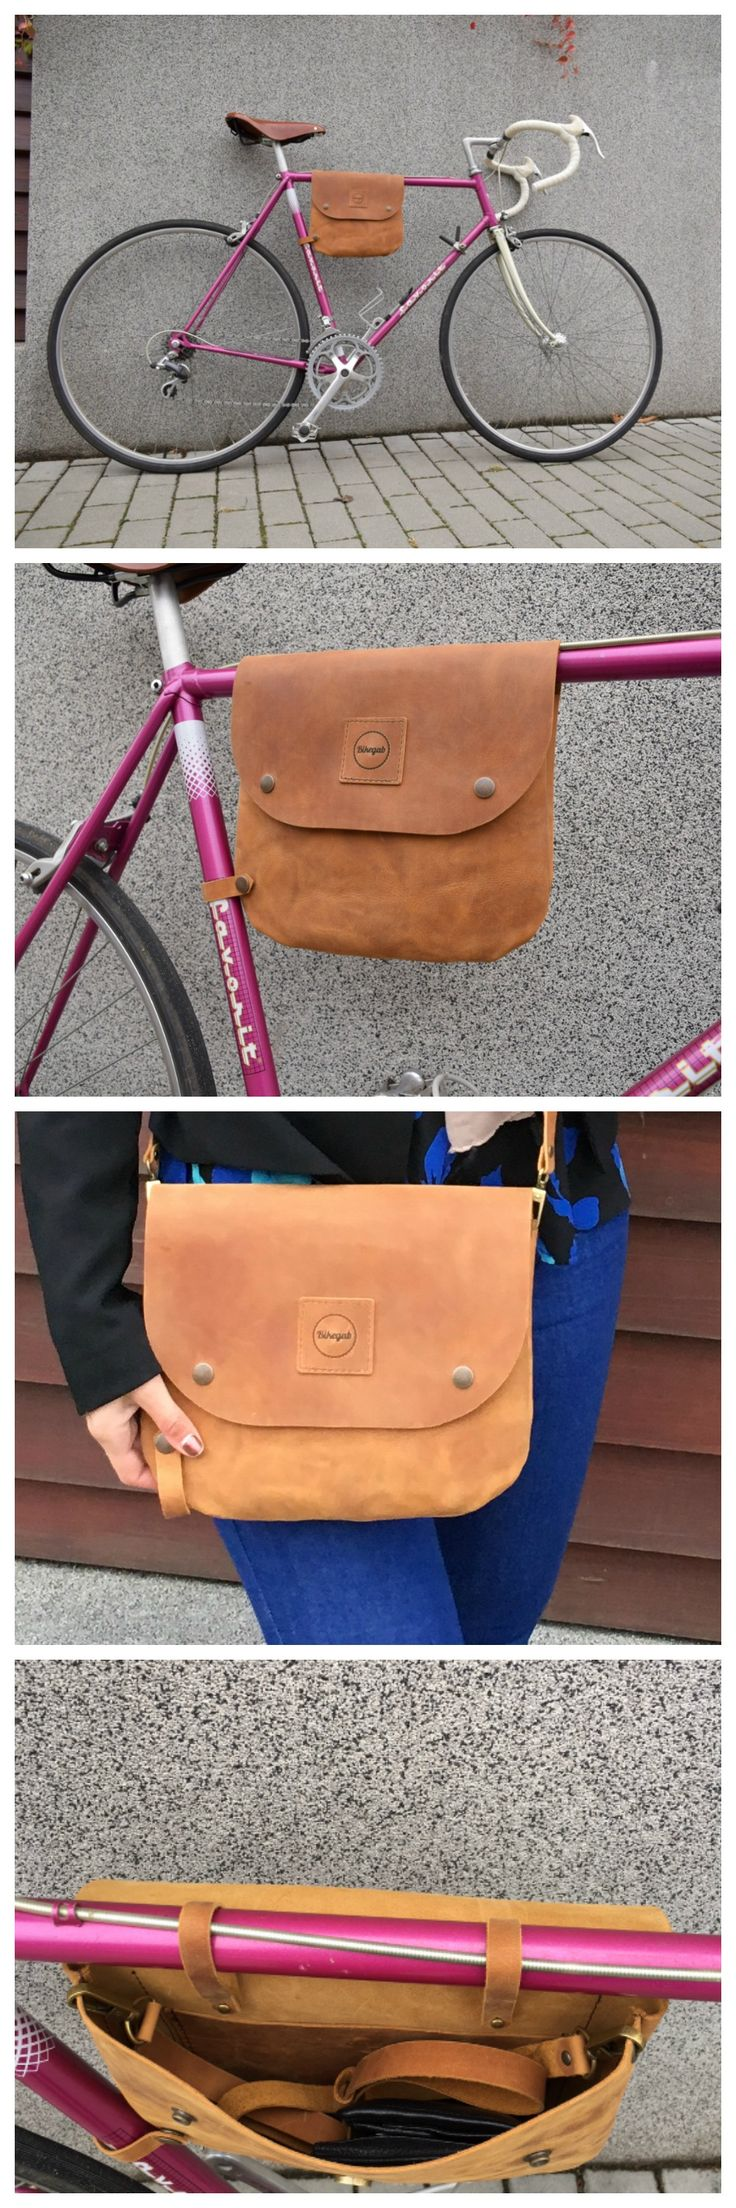 Leather frame bag for bicycle by Bikegab. Now on Etsy!   https://www.etsy.com/listing/467117286/leather-bicycle-frame-bag-shoulder-bag